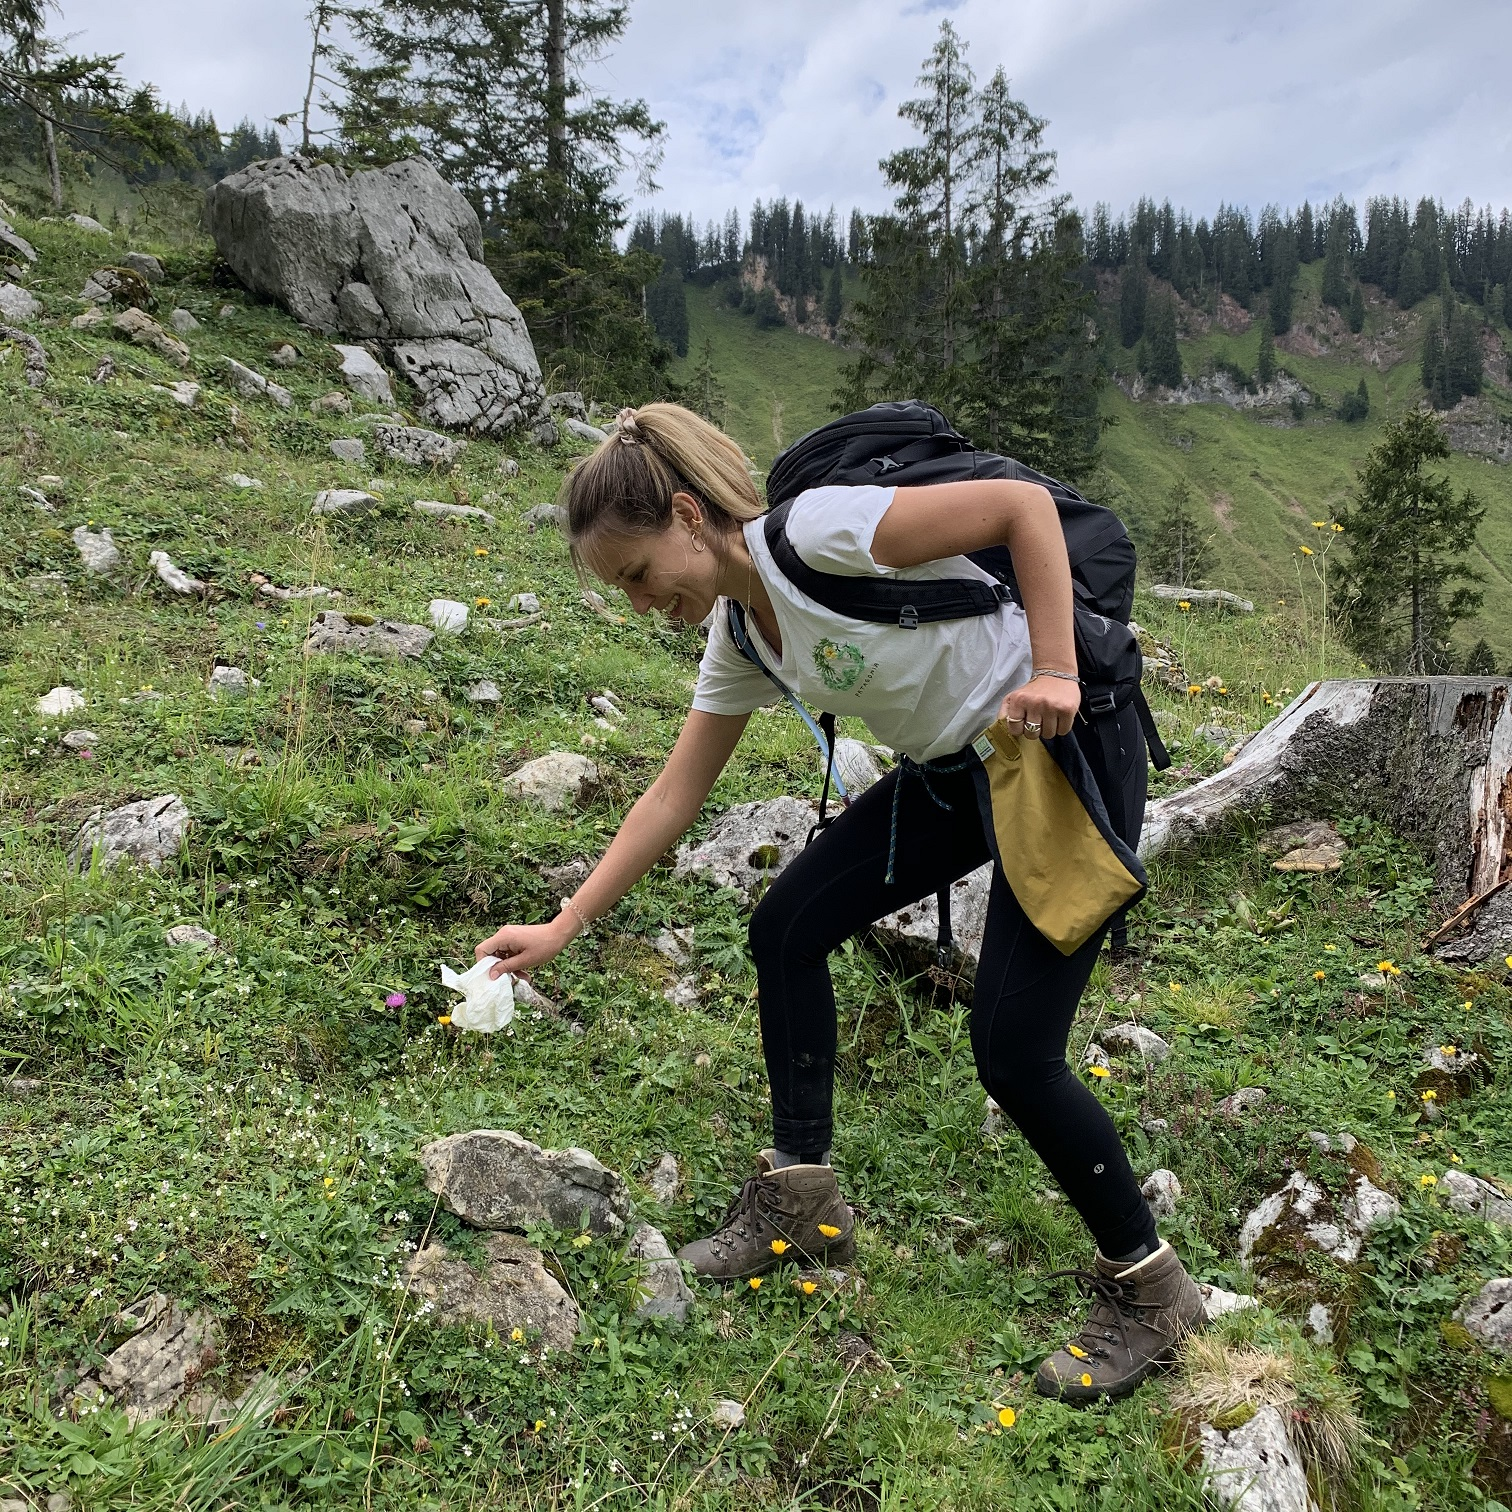 #hikeuppickup Müllsammelaktion im Mangfallgebirge/Hirschberg (Bayern)